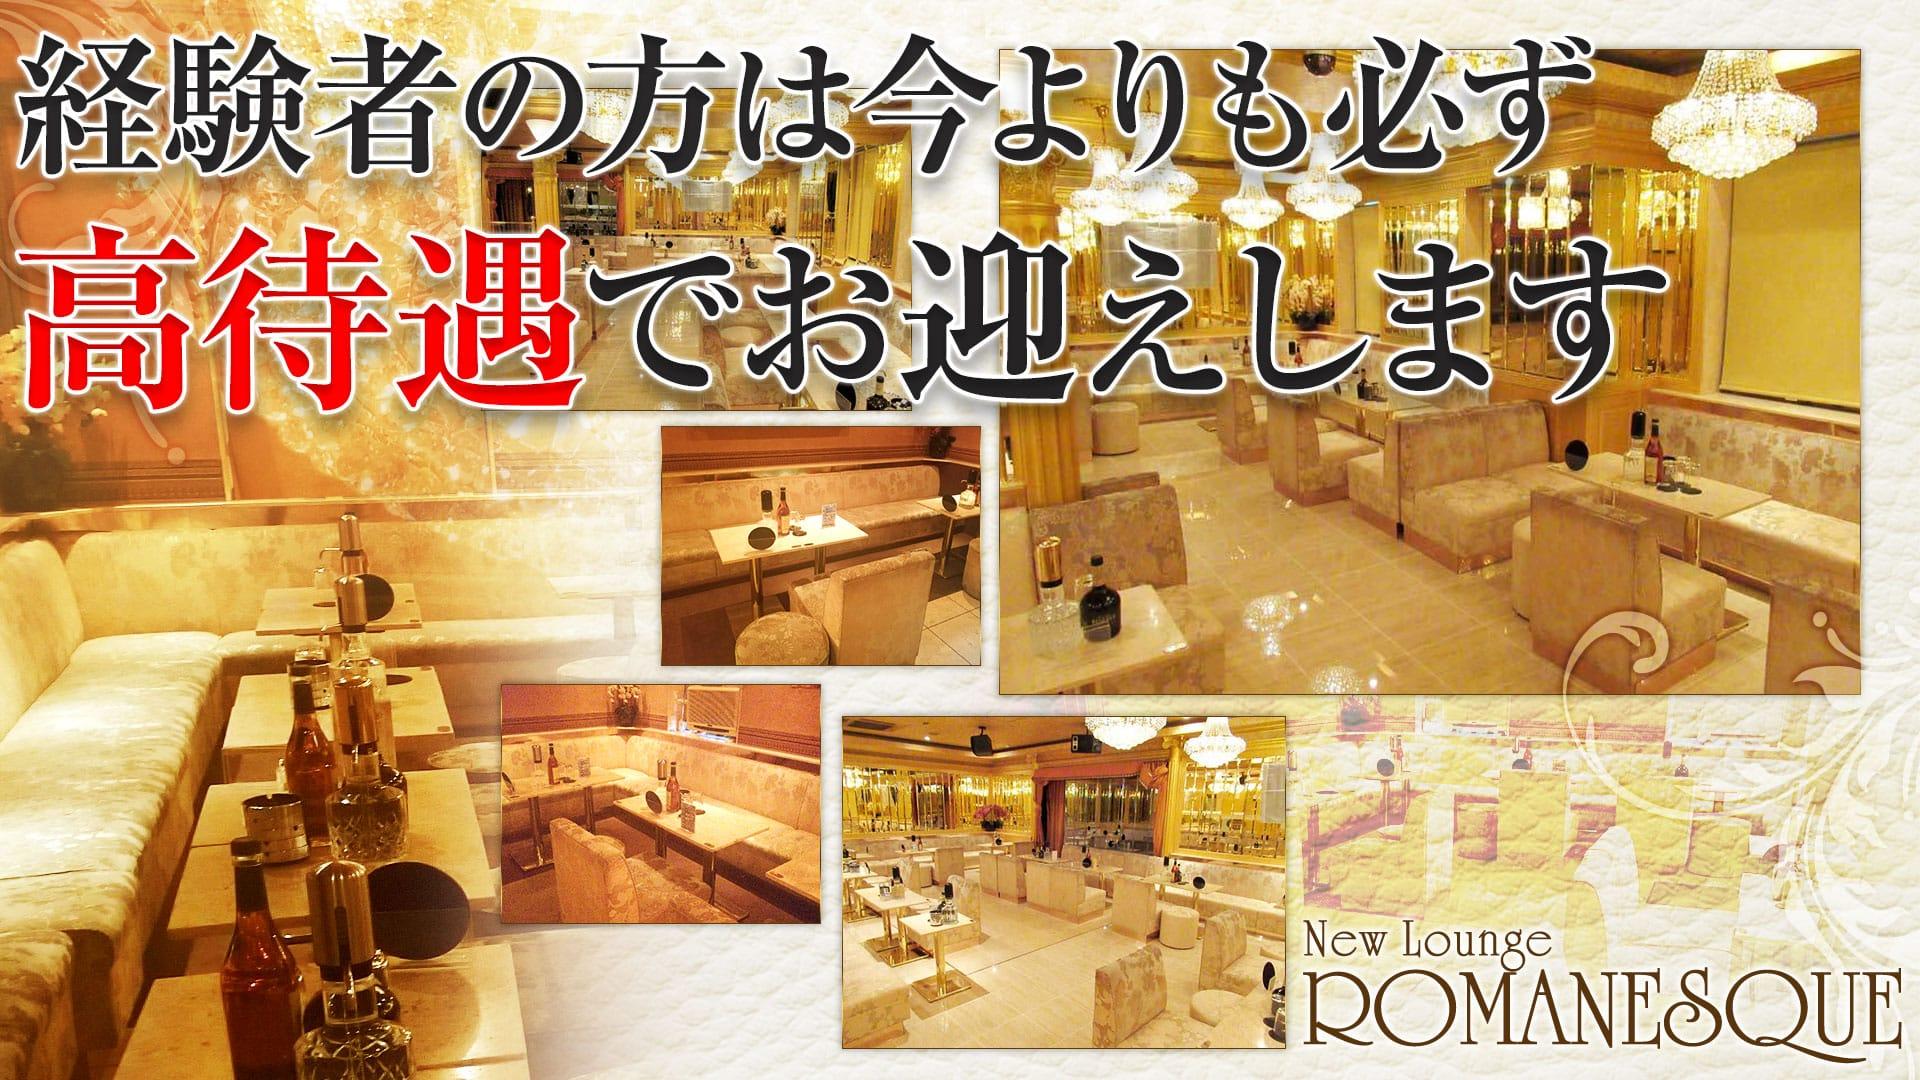 New Lounge ROMANESQUE(ロマネスク)  船橋キャバクラ TOP画像